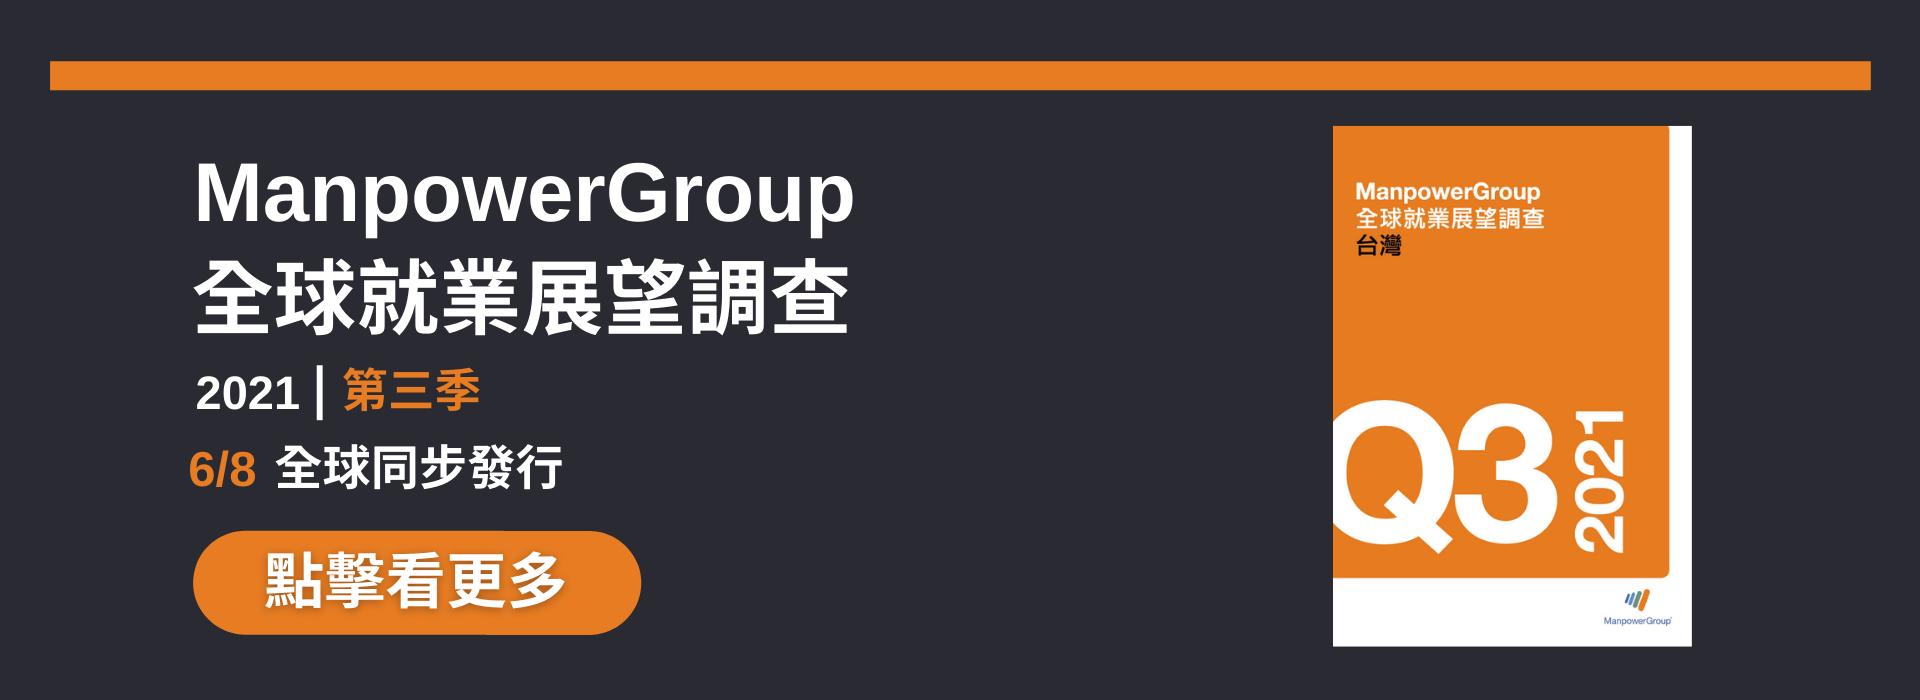 ManpowerGroup 2021 Q3 全球就業展望調查